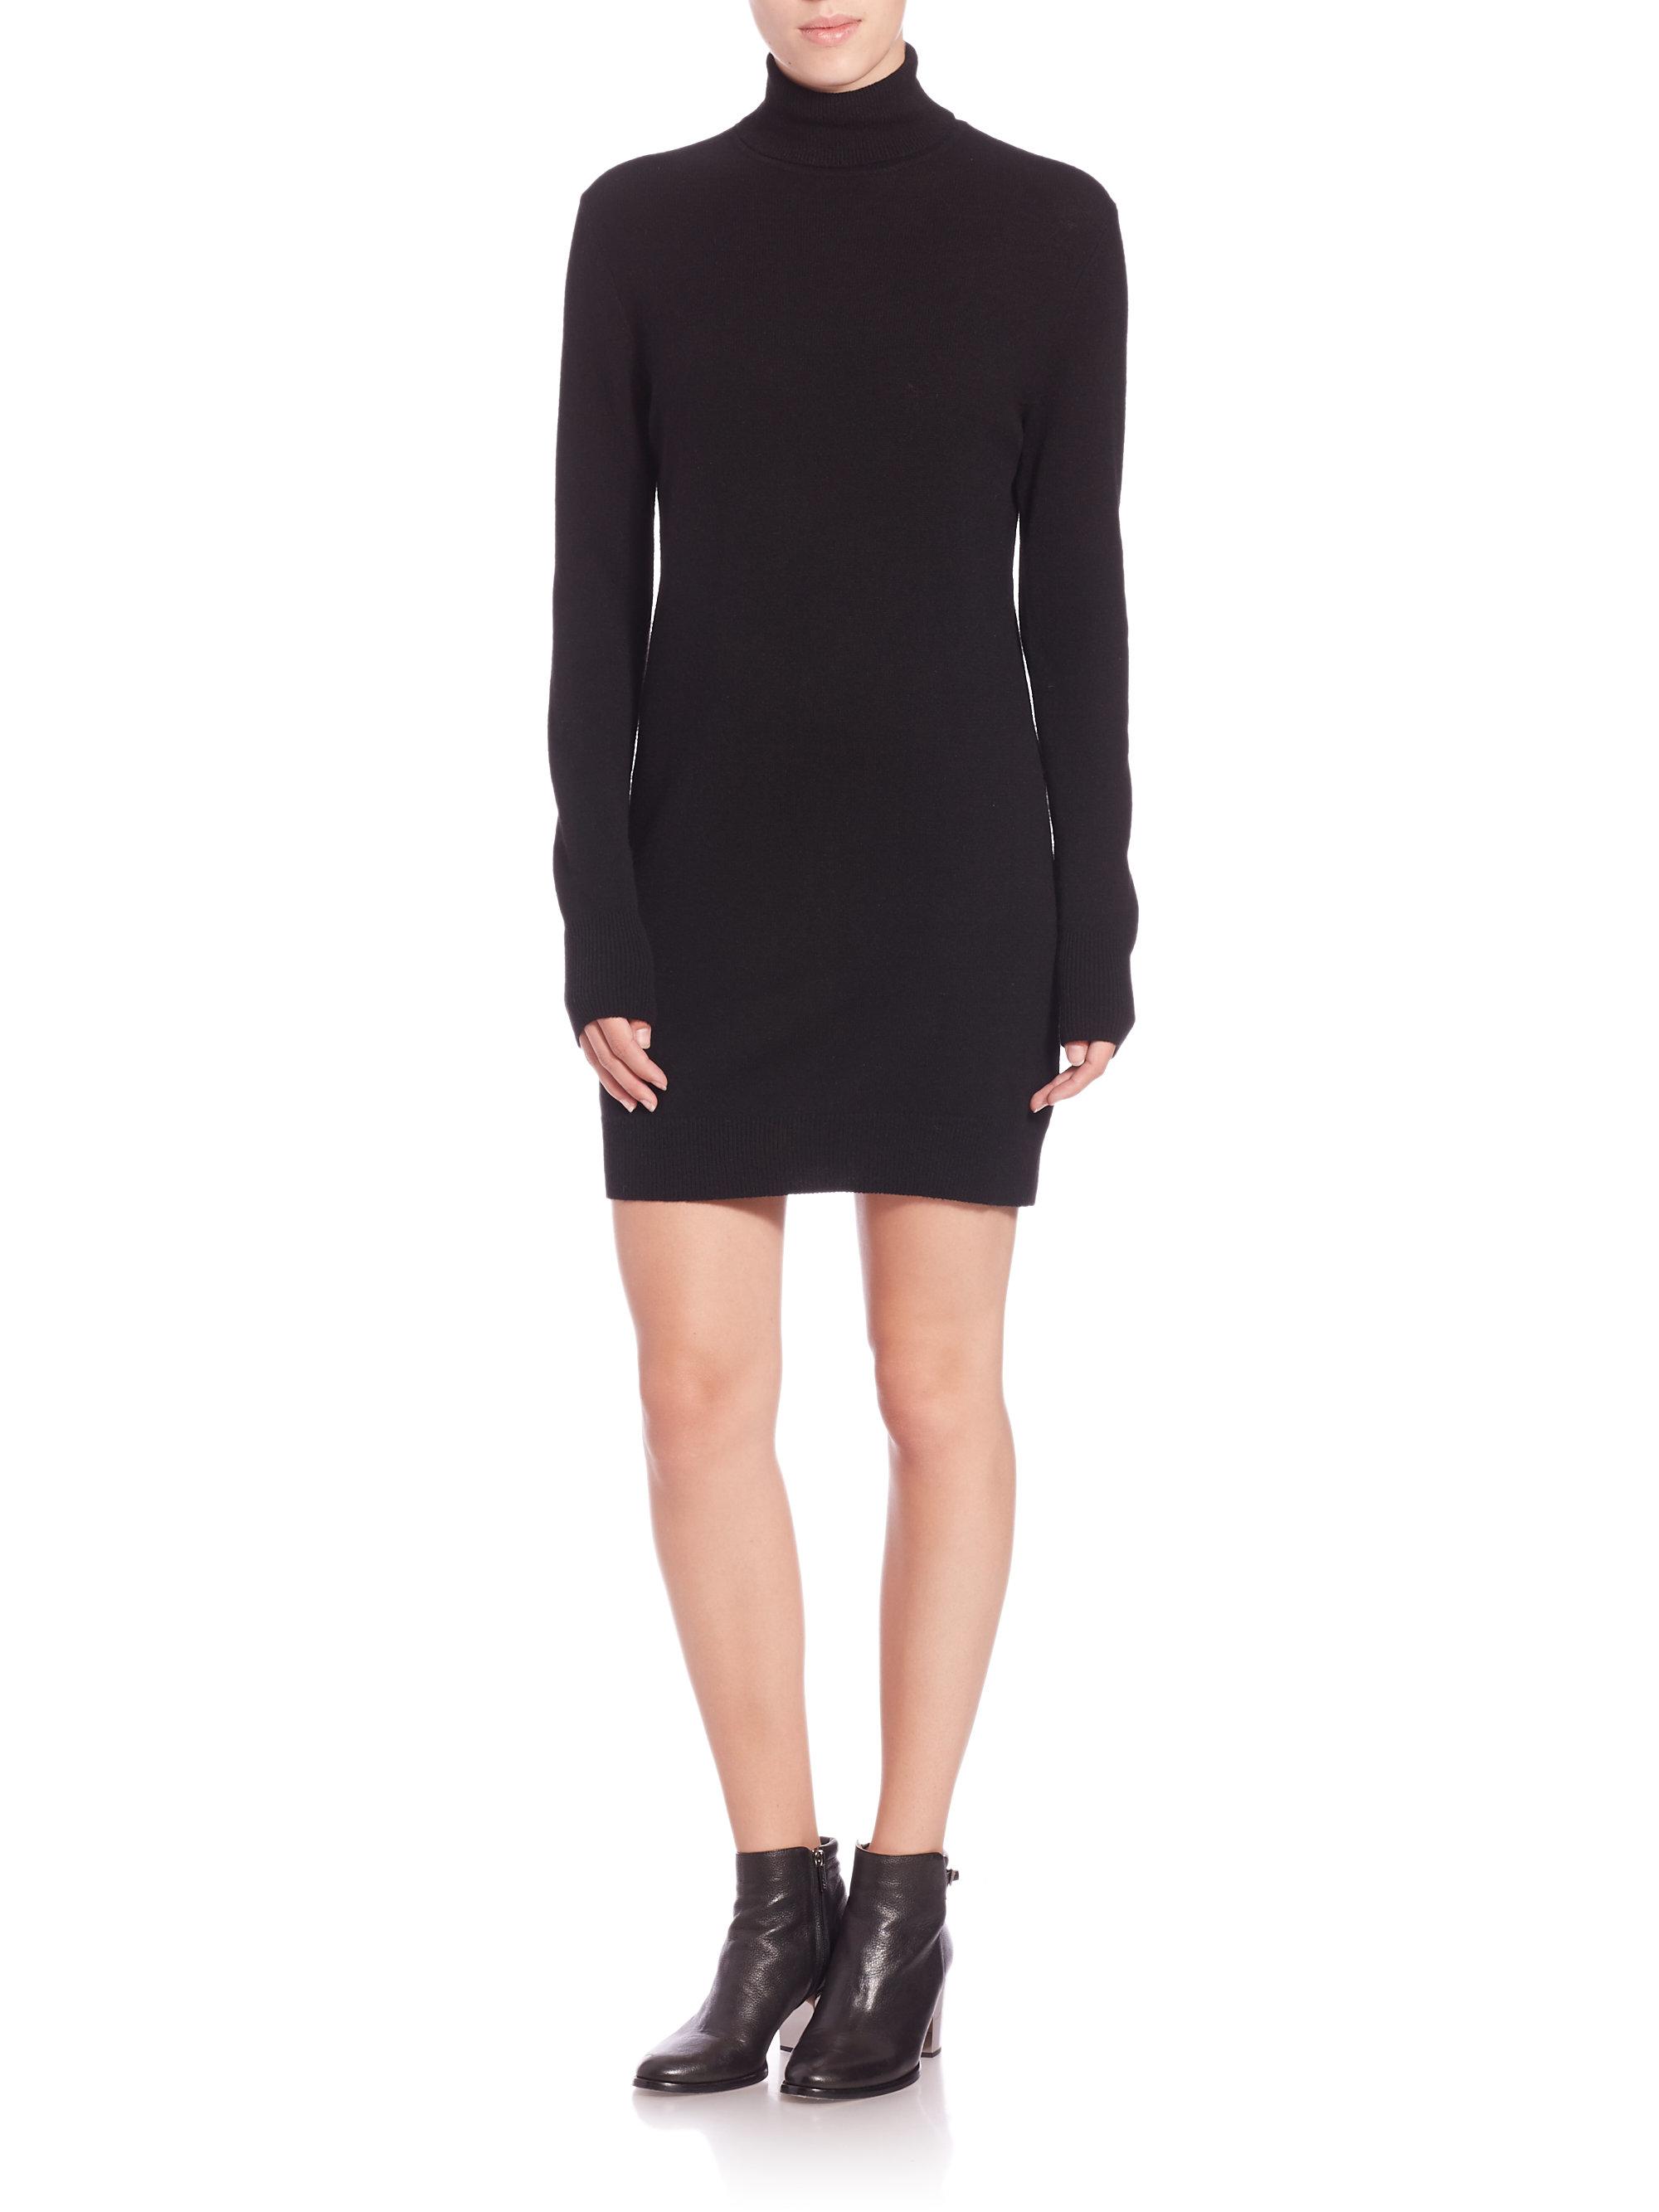 Black Cashmere Sweater Dress - Cashmere Sweater England